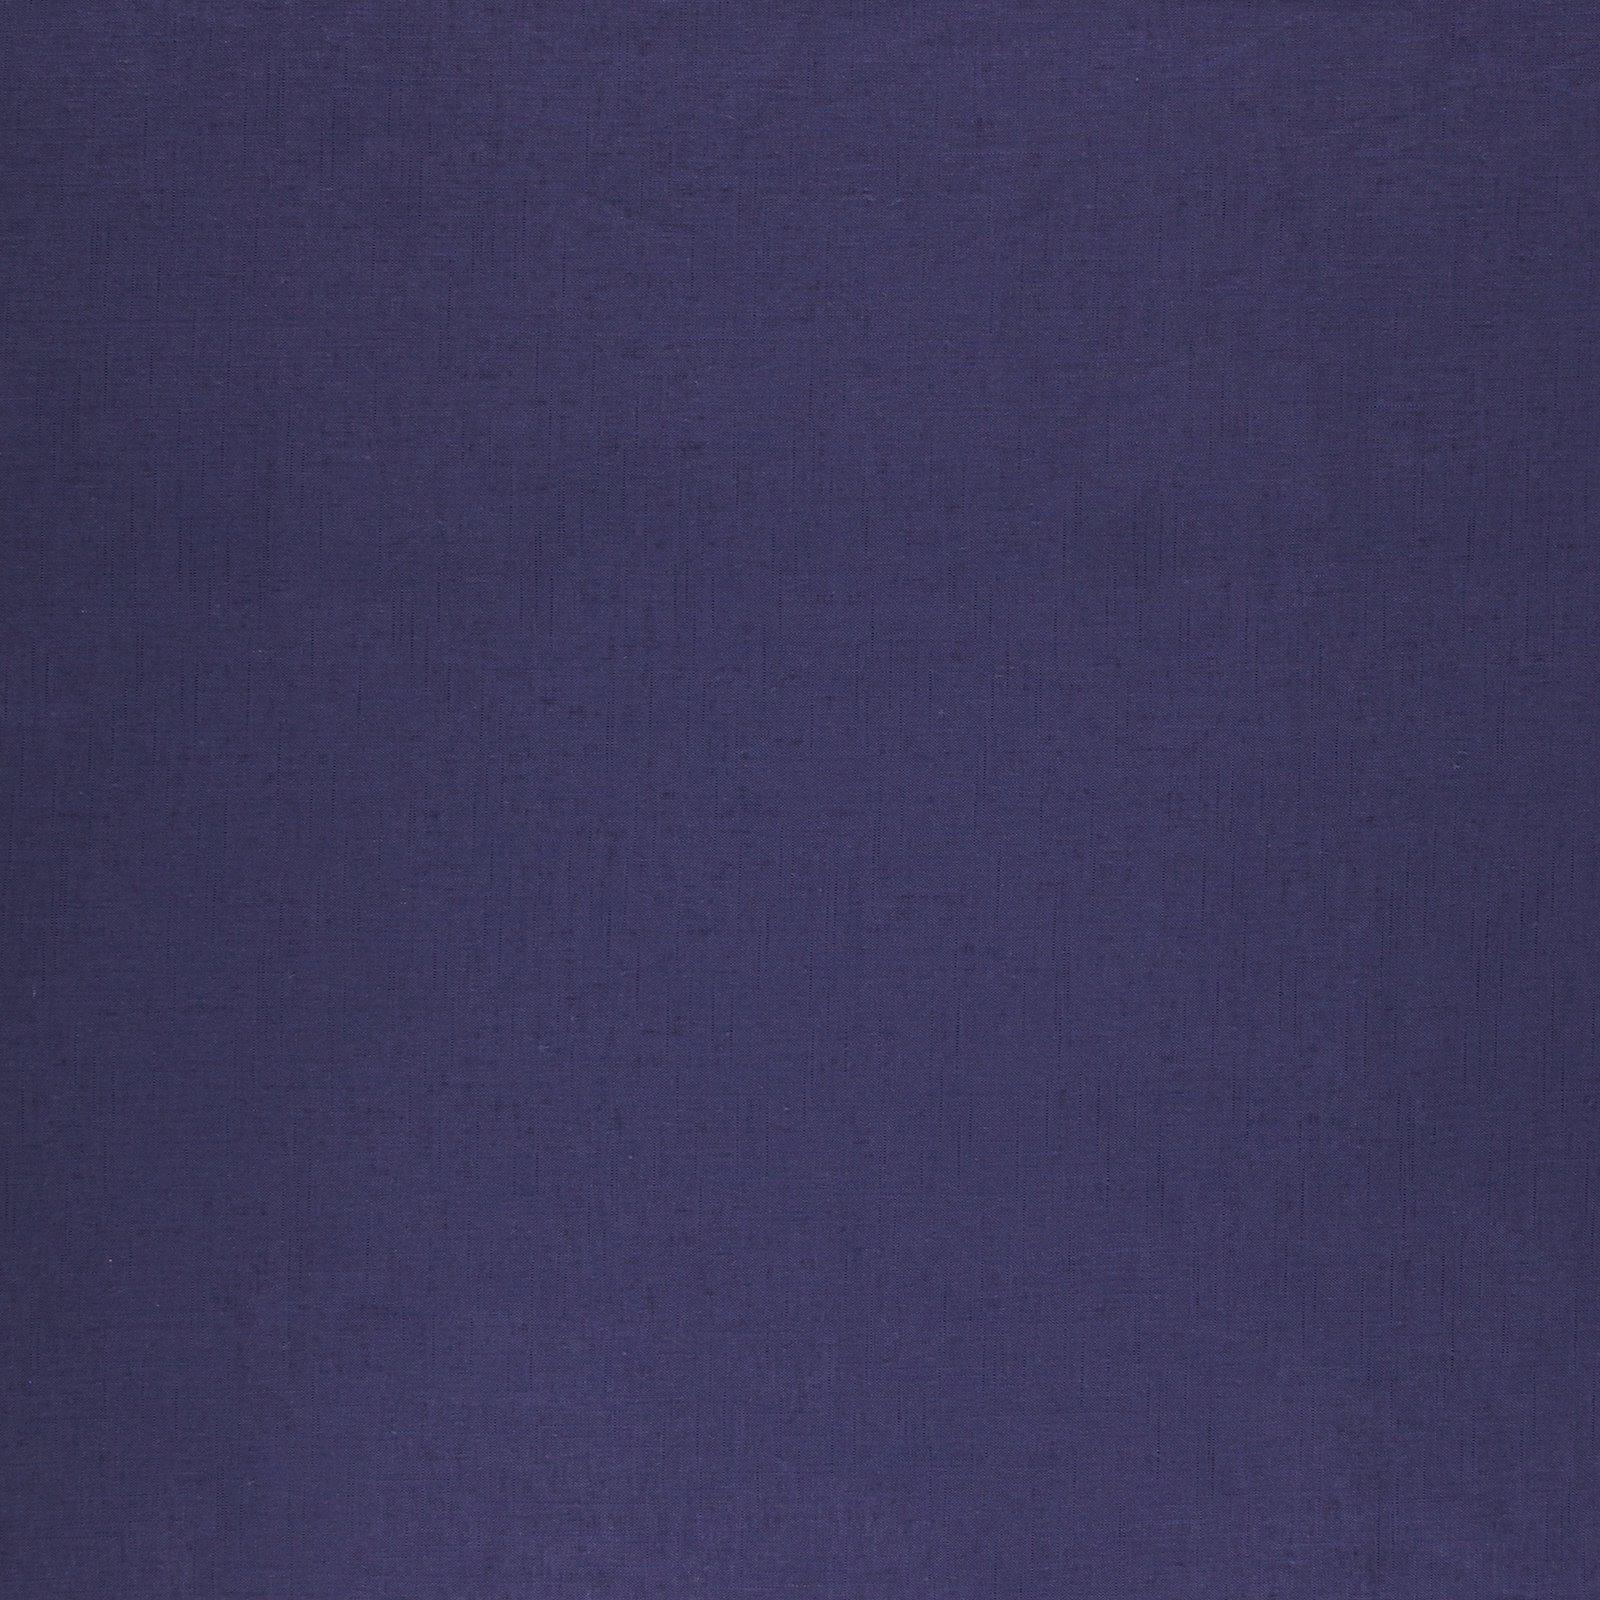 Coarse linen/viscose dark cobalt 852321_pack_solid